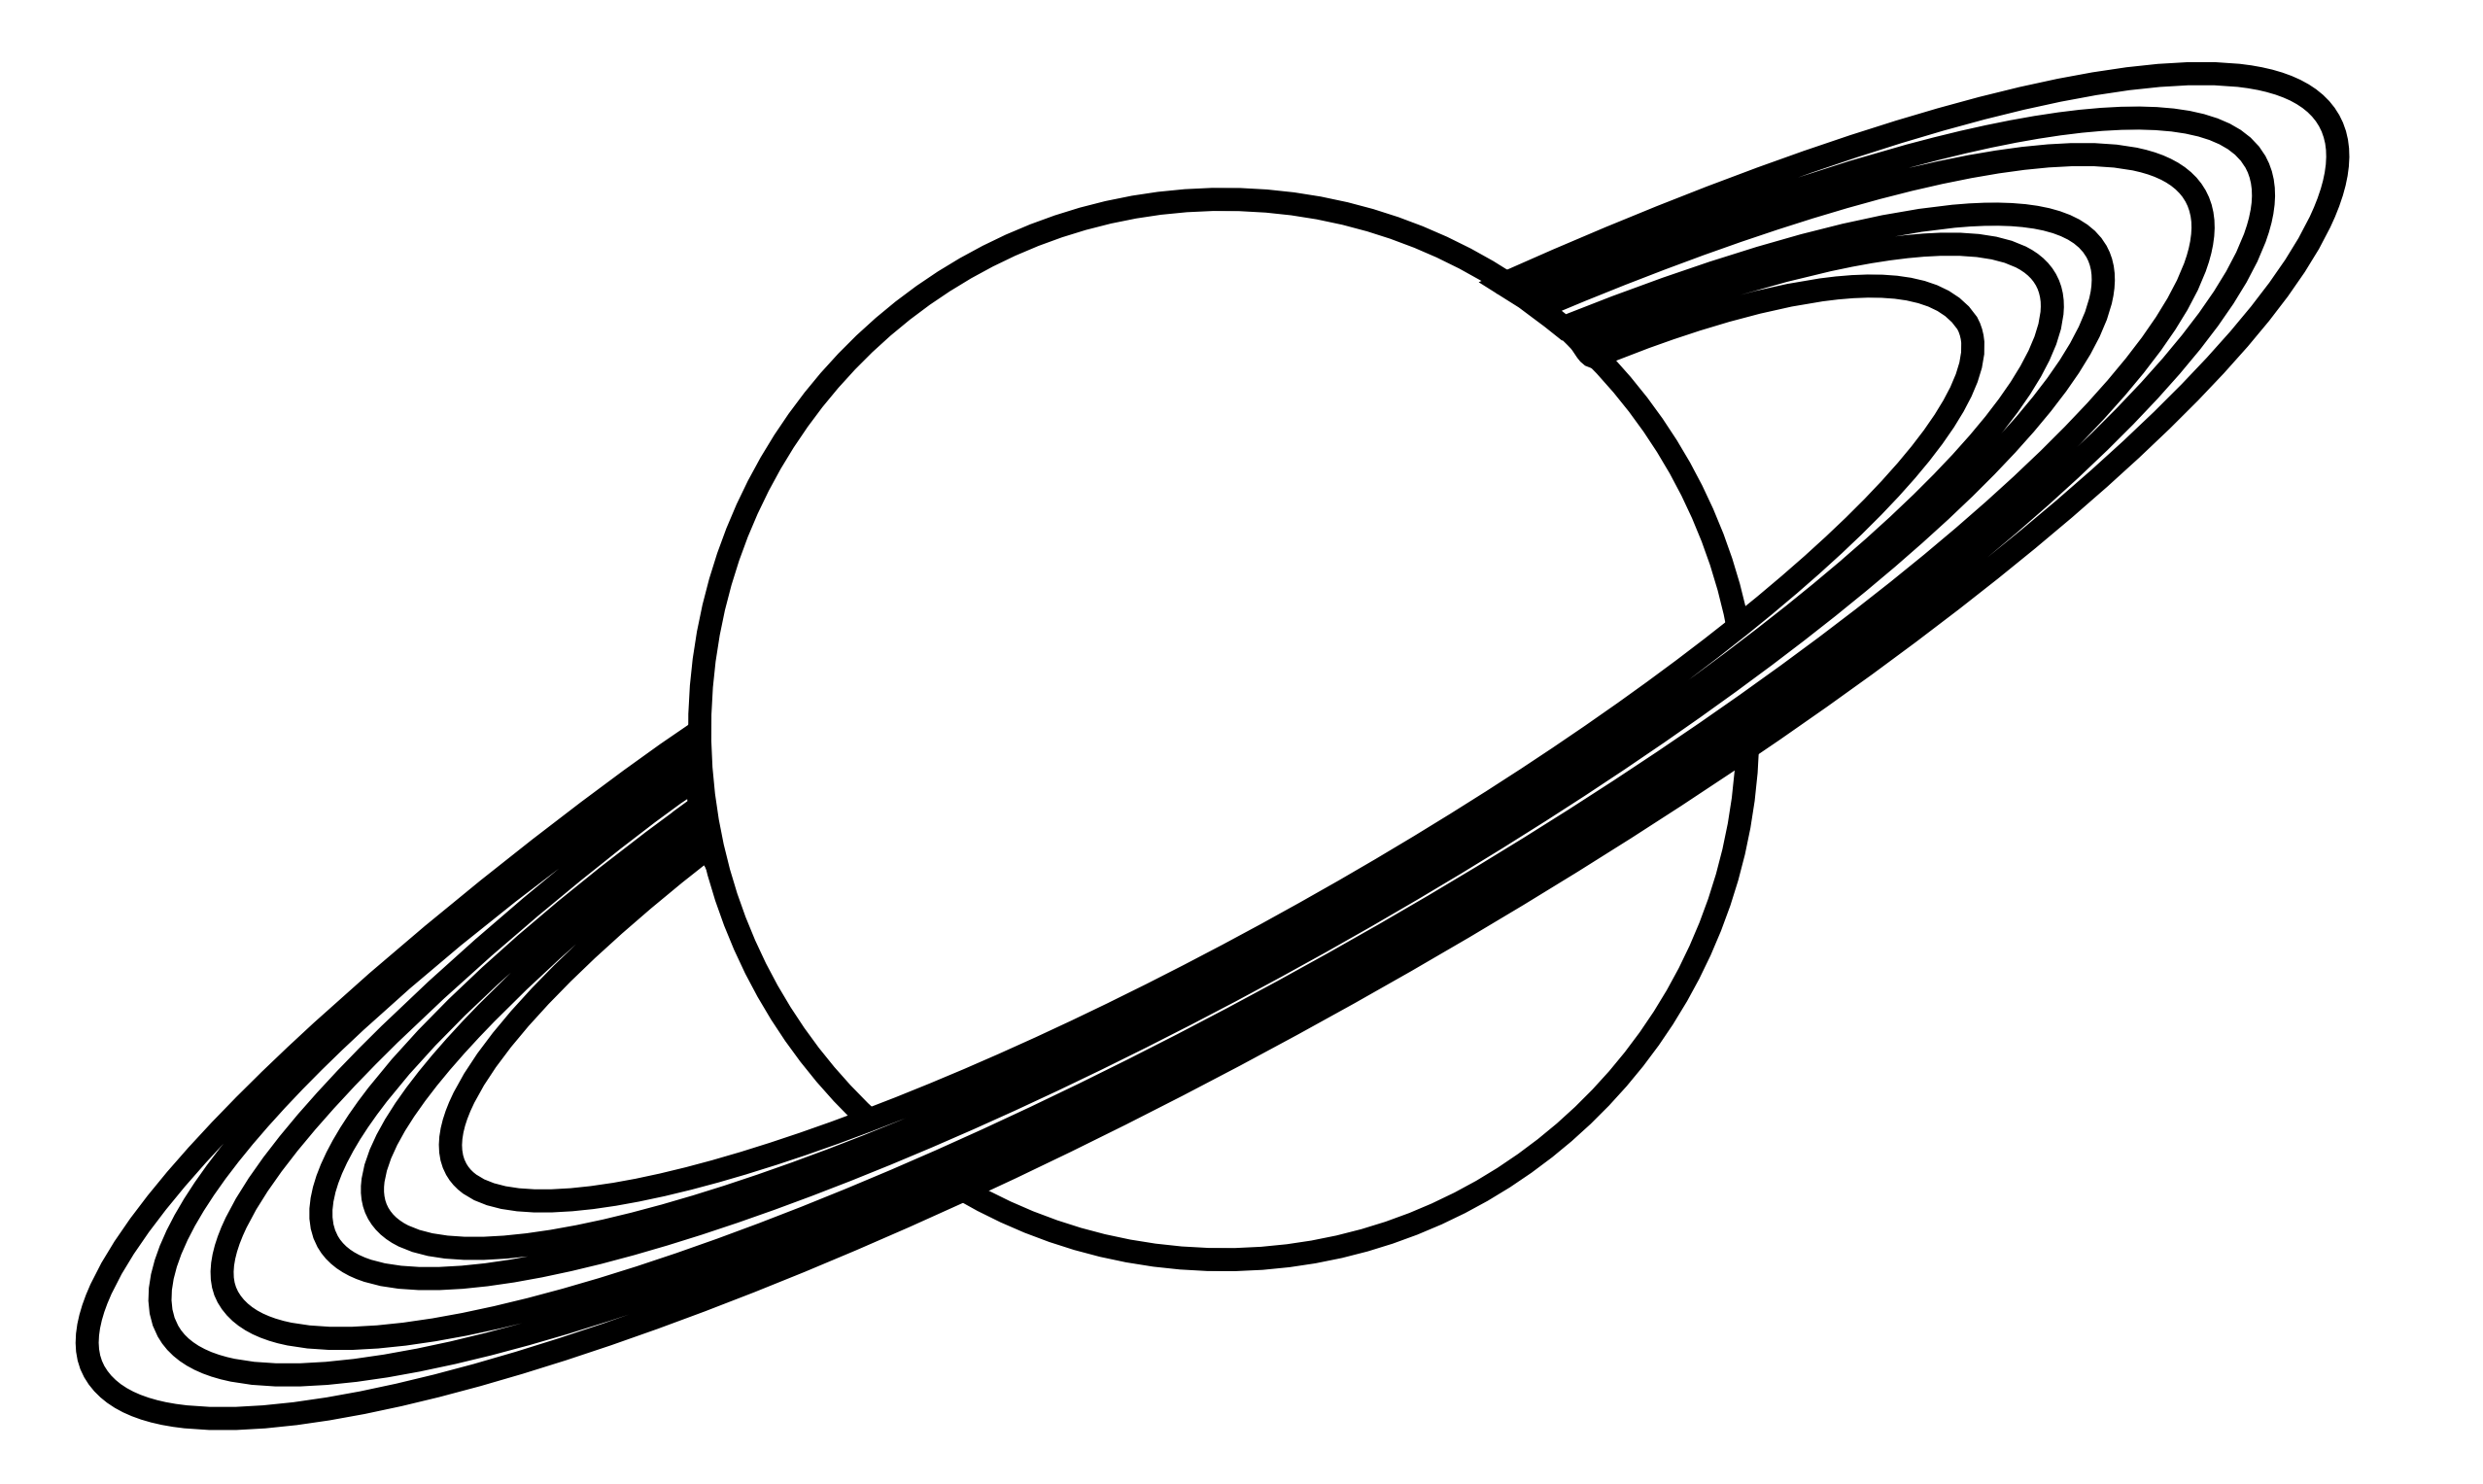 Planeten clipart planetsclip. Planet clip art cartoon